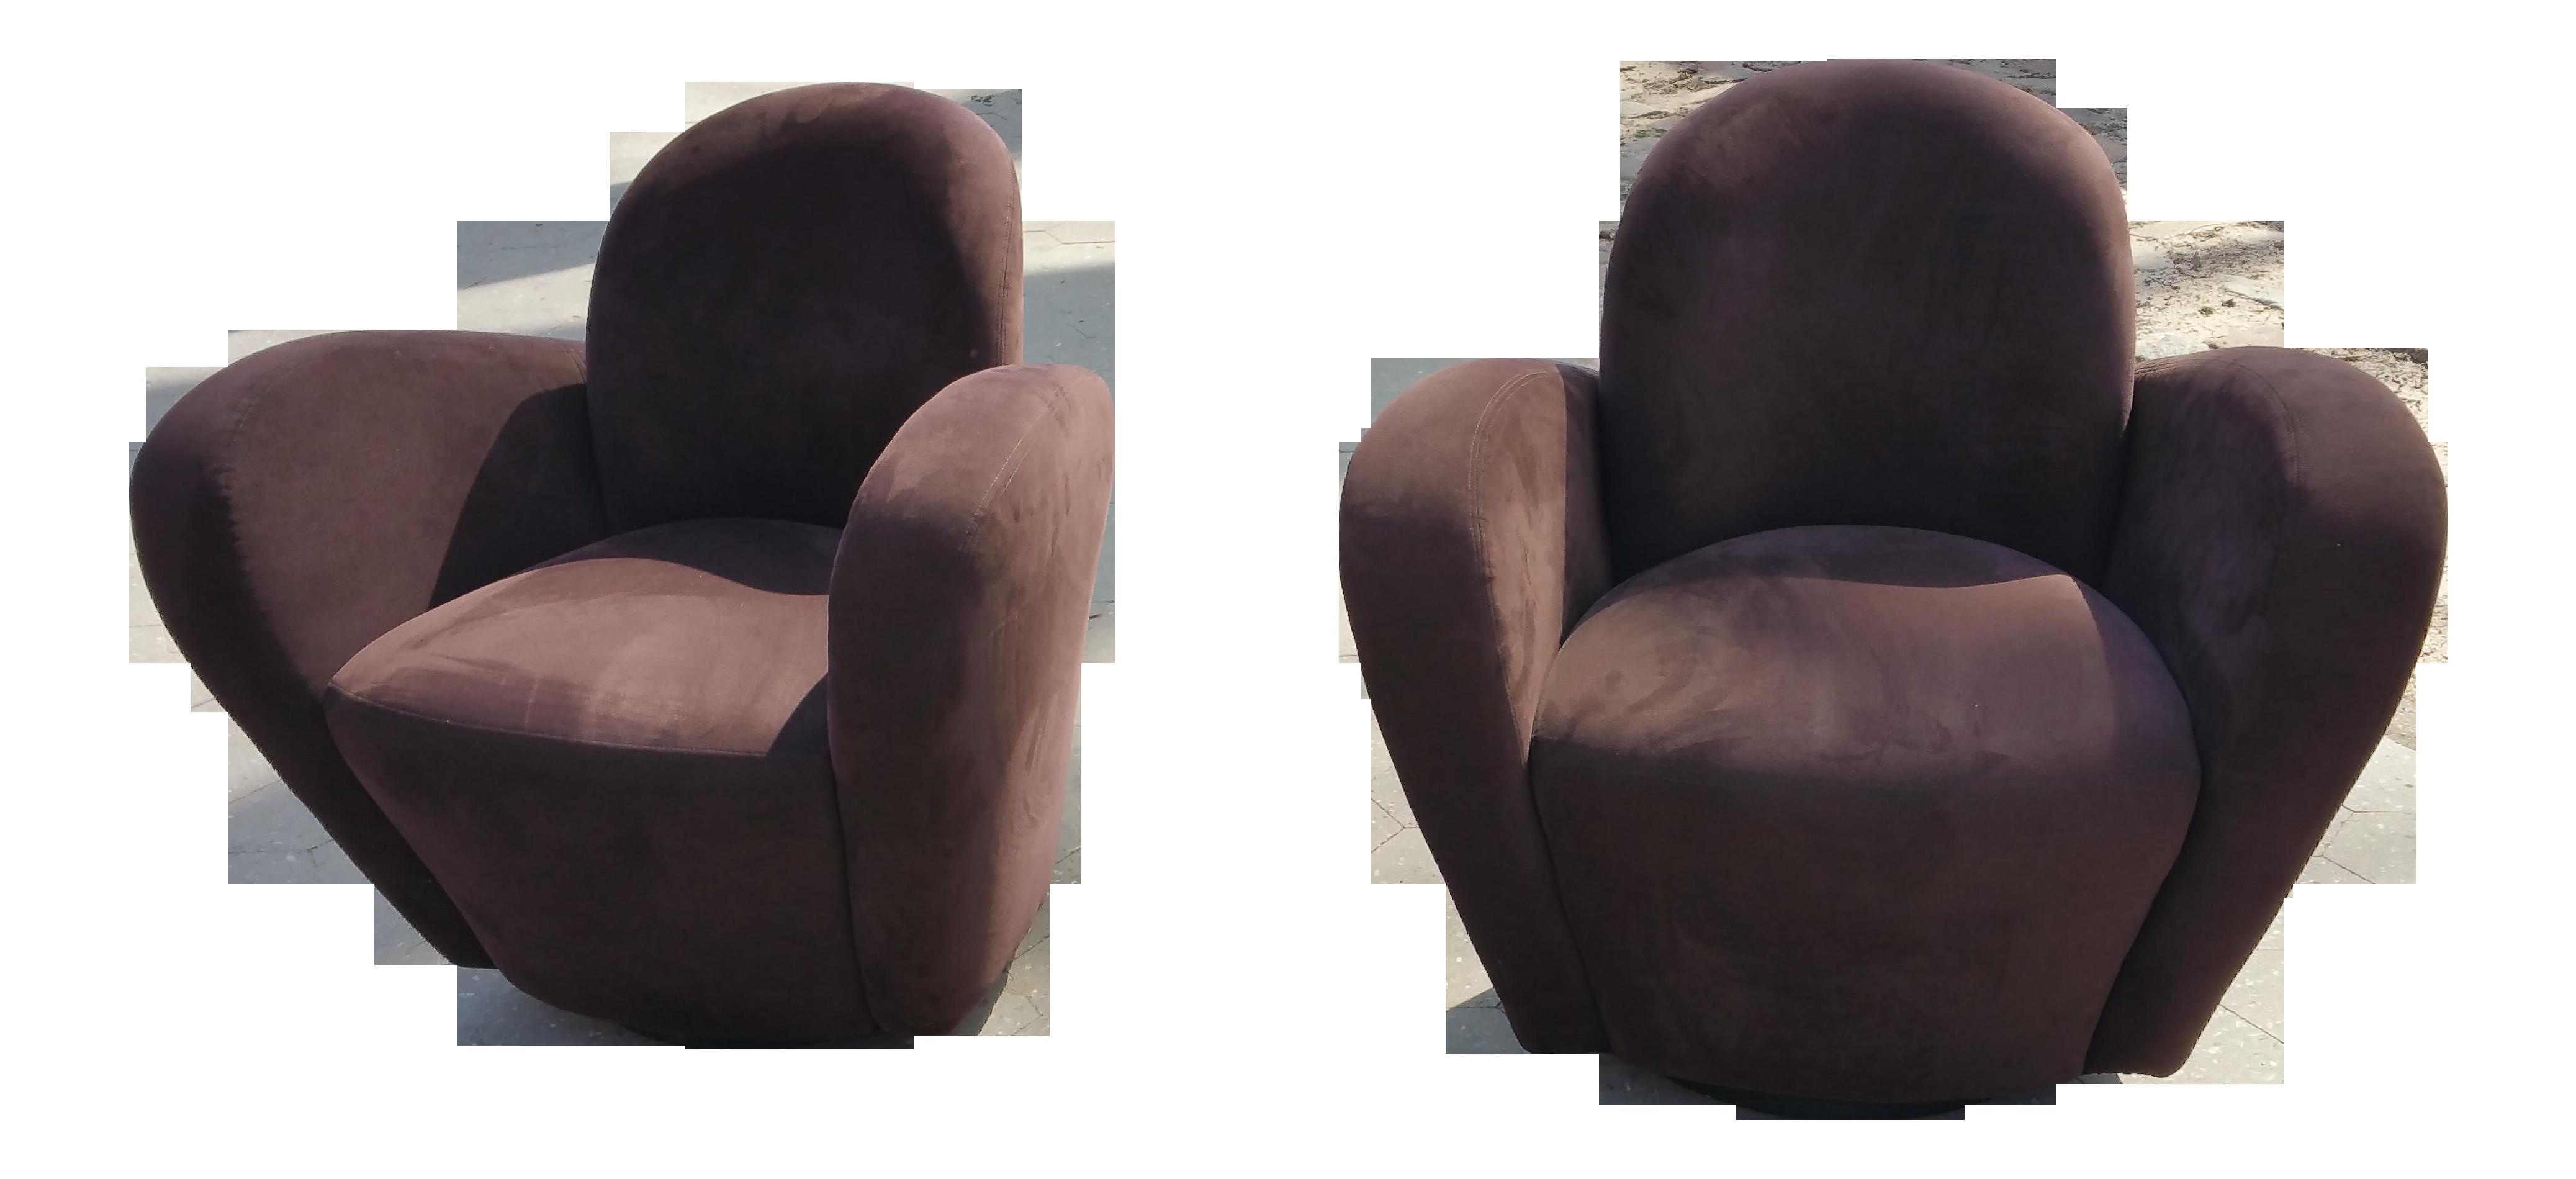 Rare Vladimir Kagan Wrap Around Swivel Barrel Chairs - a Pair  sc 1 st  Chairish & Rare Vladimir Kagan Wrap Around Swivel Barrel Chairs - a Pair | Chairish